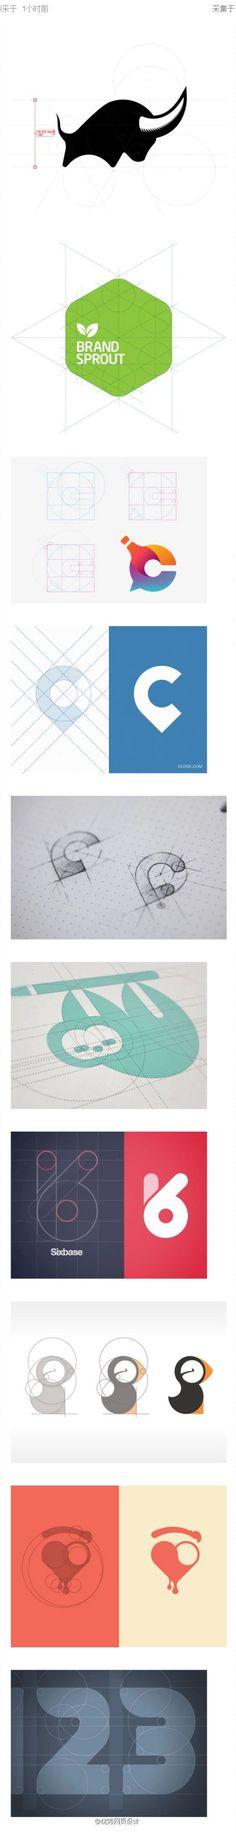 Simple GPS coordinate arrow with letter E